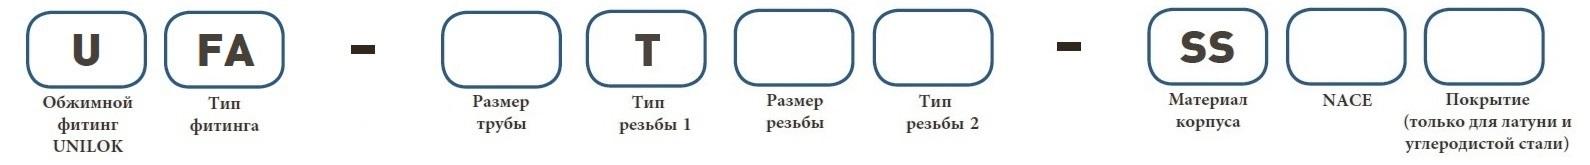 Форма заказа UFA